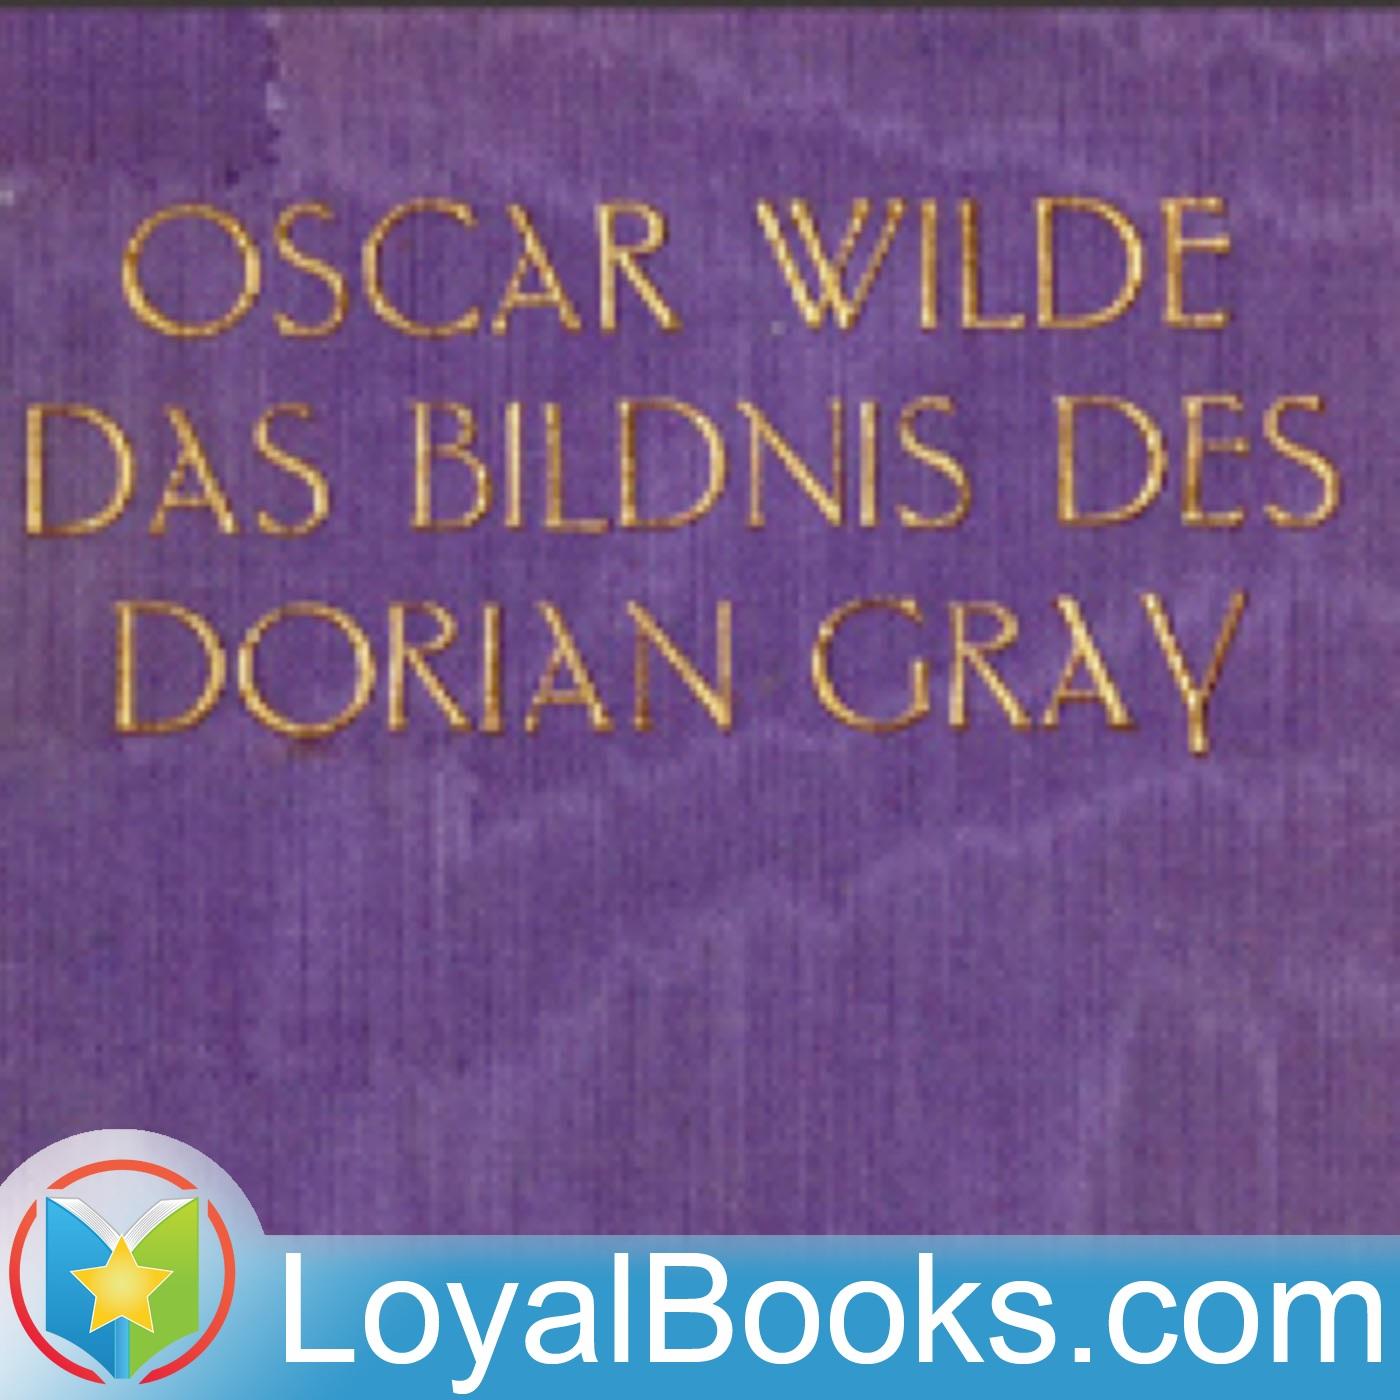 <![CDATA[Das Bildnis des Dorian Gray by Oscar Wilde]]>